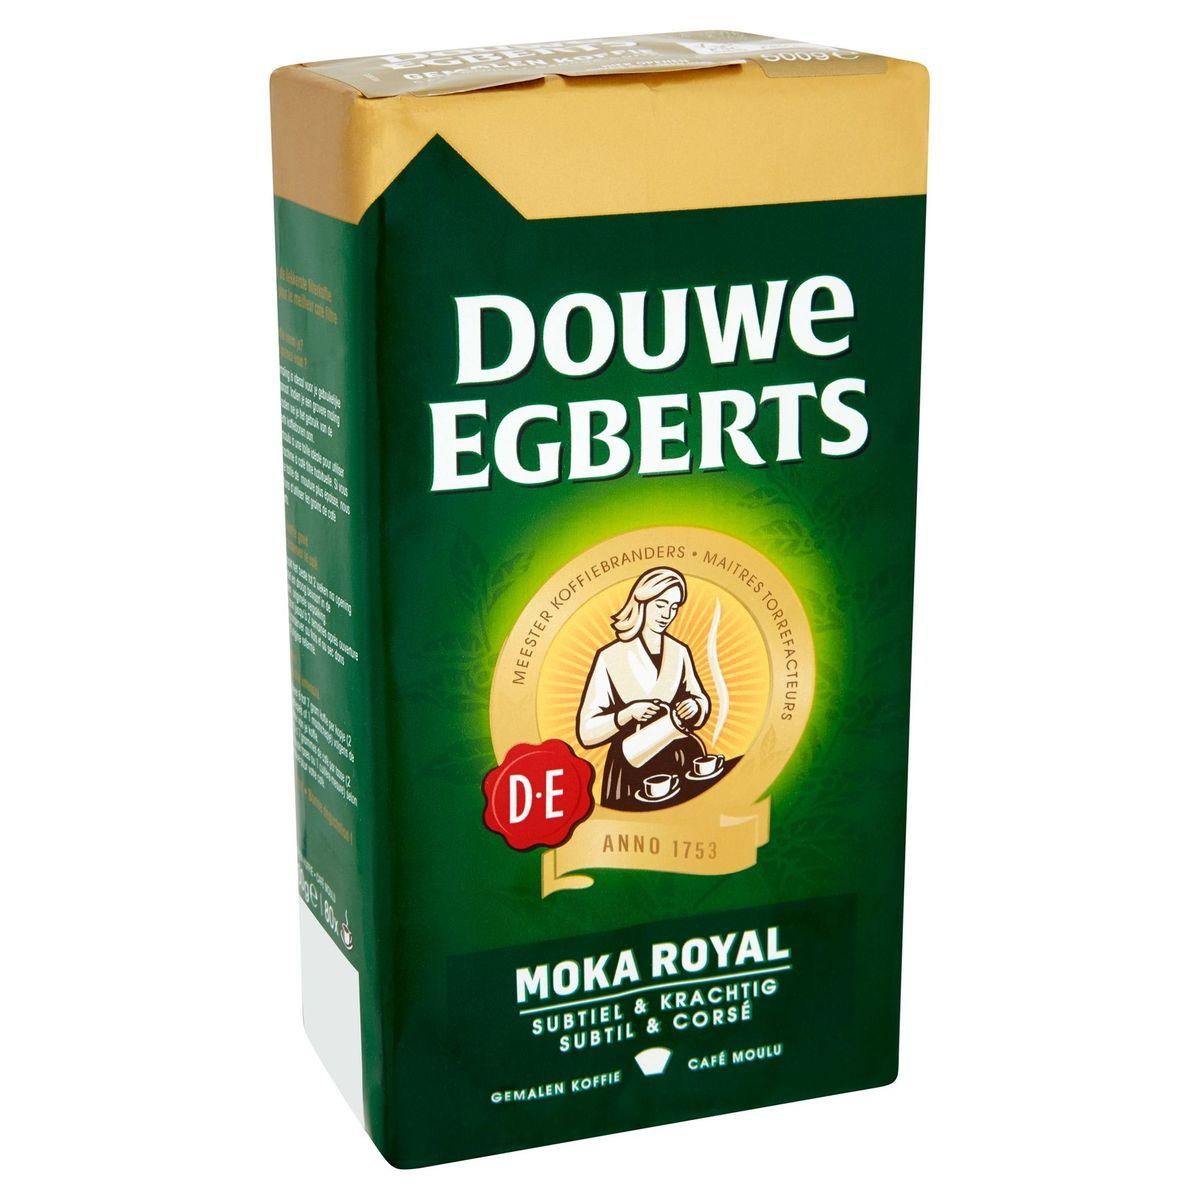 DOUWE EGBERTS Koffie Gemalen Moka Royal 500 g